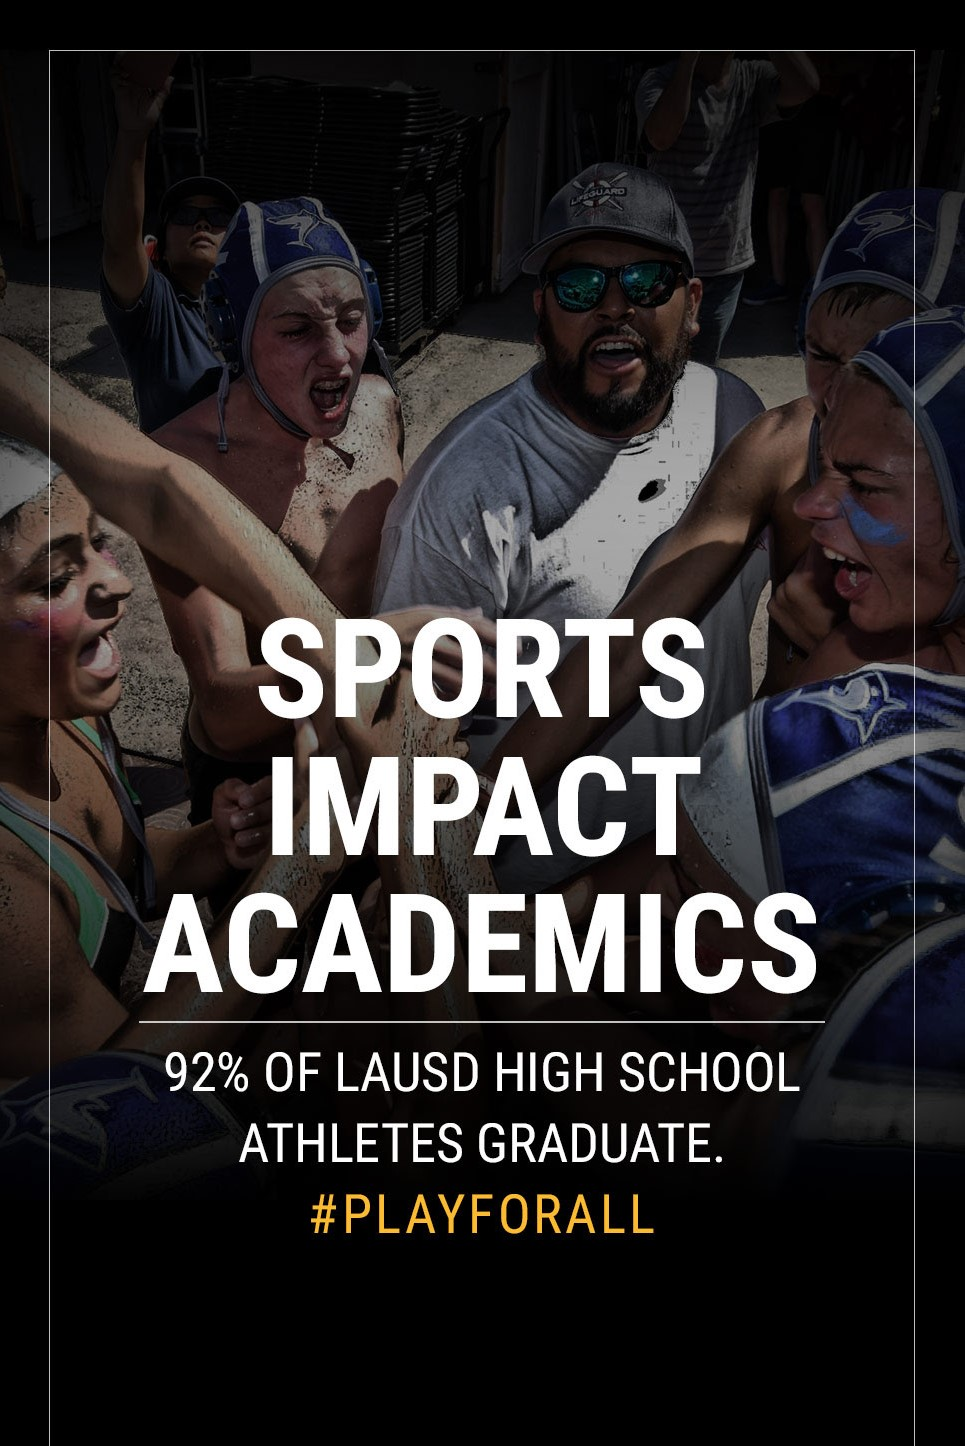 Sports-Impact-Academics-10-12-17-website